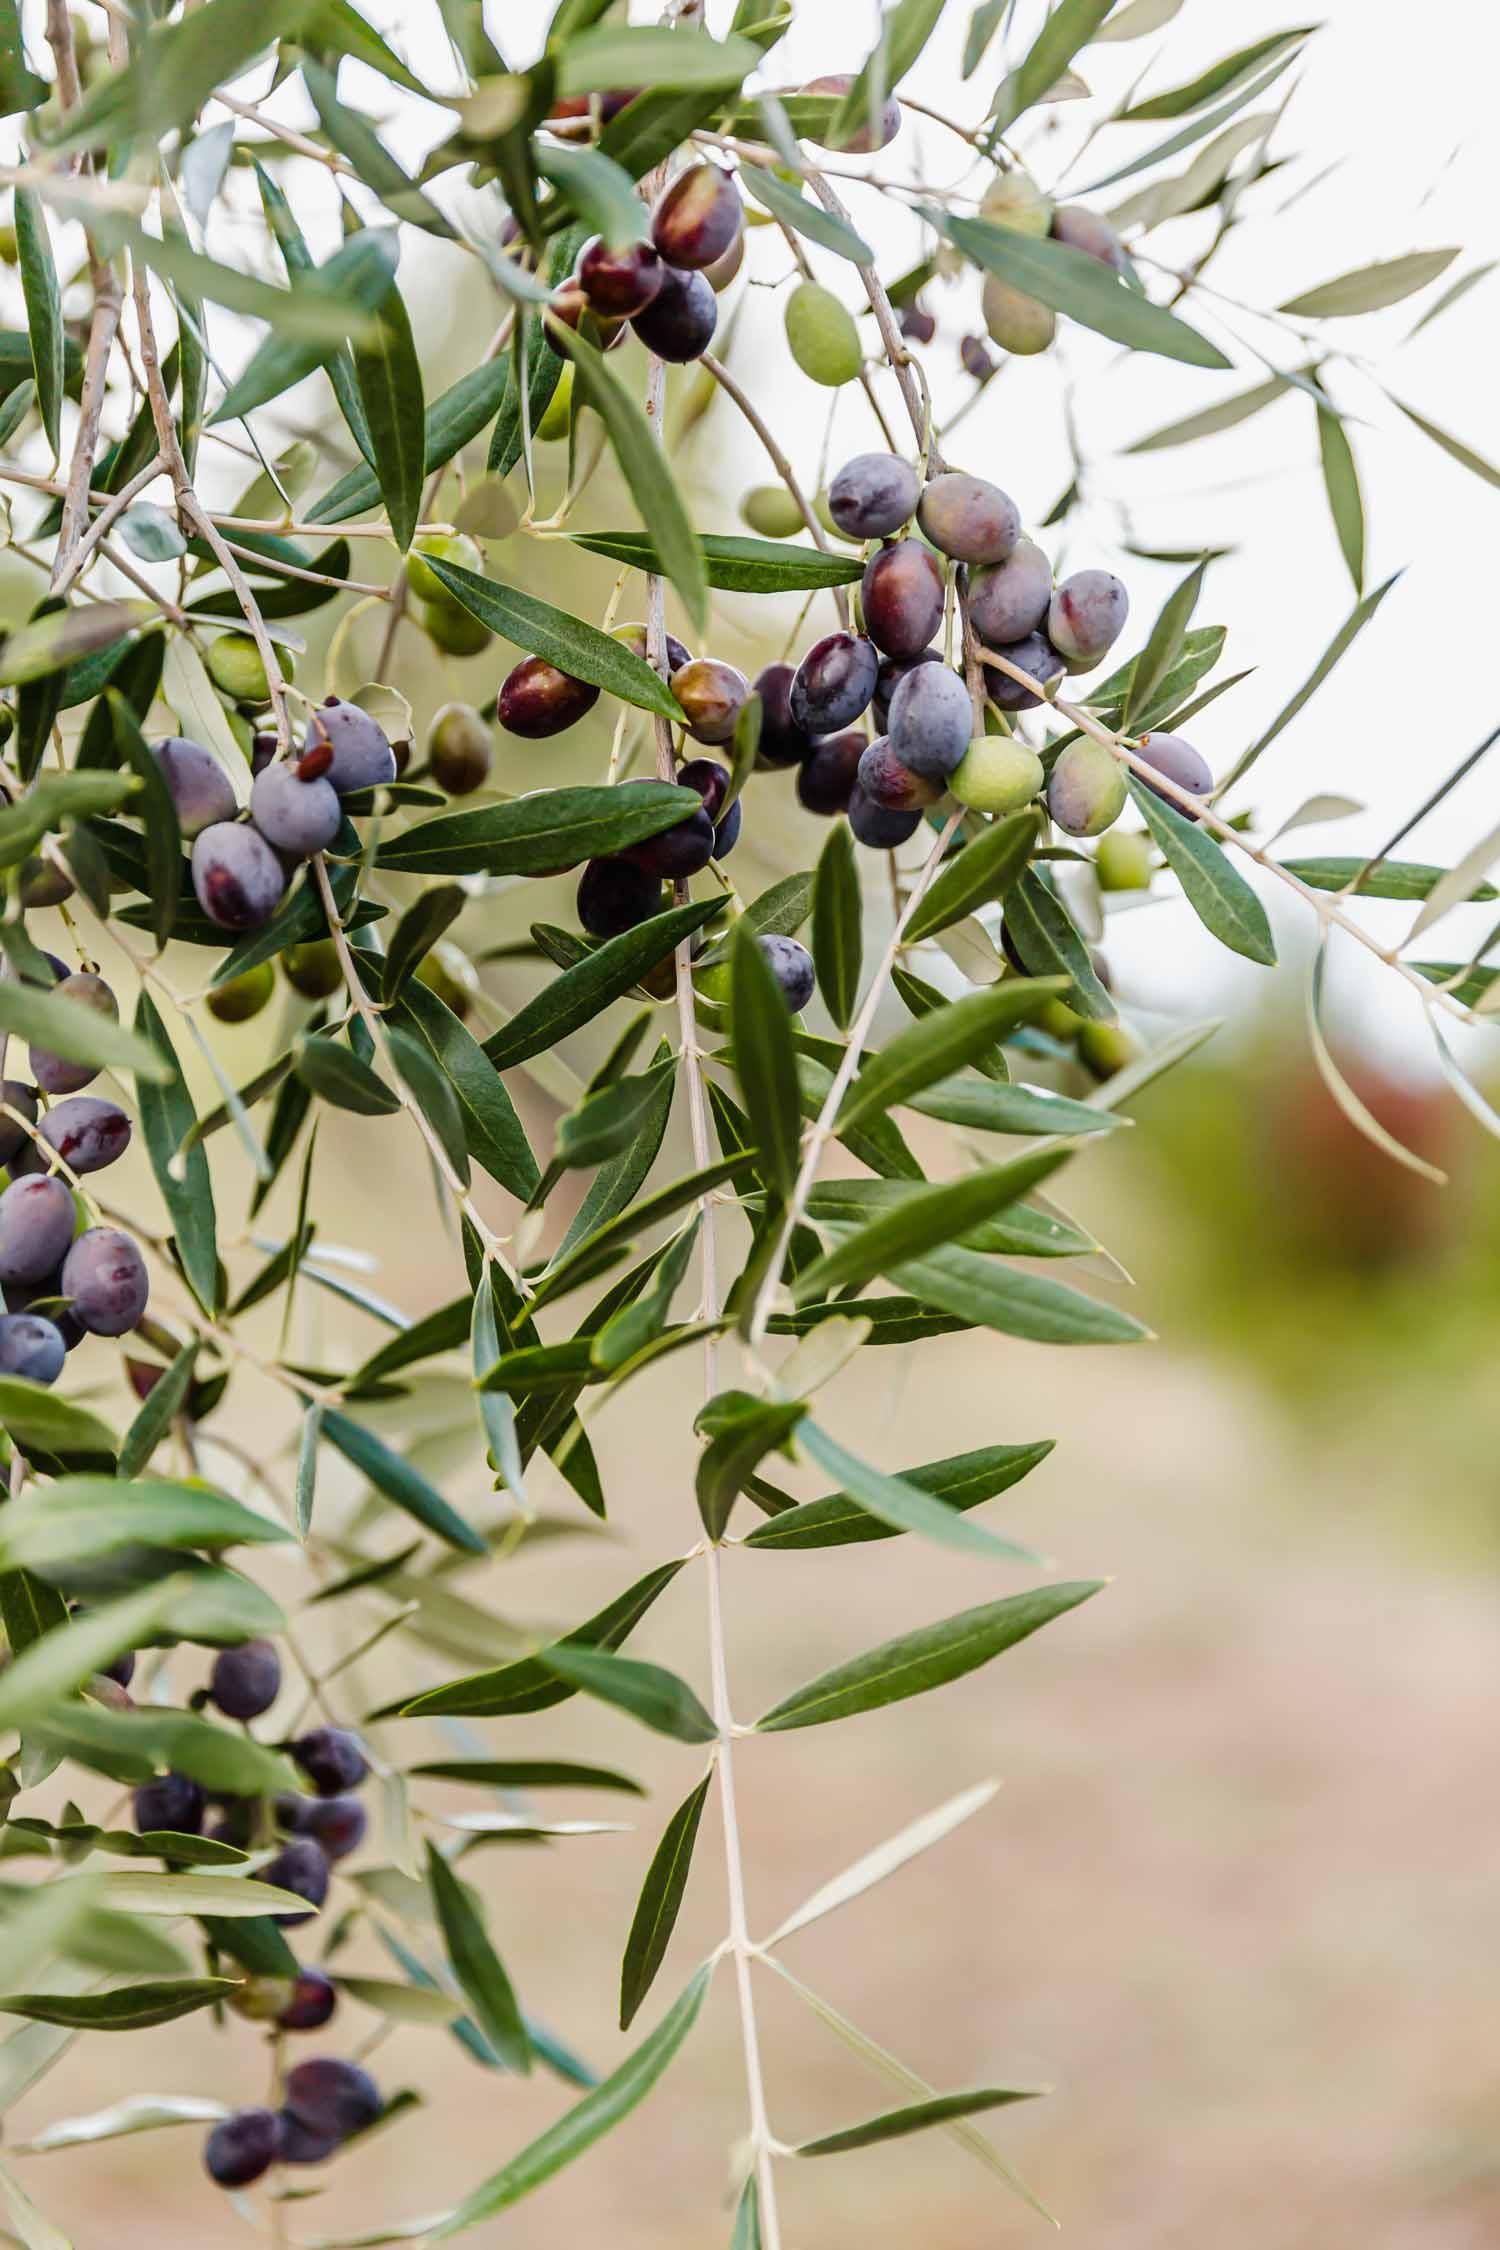 Olives growing at i pini in Tuscany, Italy. The olives are grown to make their own organic olive oil. #tuscany #organicoliveoil #italy #italianfarmhouse #olivegroves #organicoliveoil #vineyards #italyinautumn #veganrestaurant #vegantravel #italytravel #veganitaly #vegantuscany #veganhotel #ecotourism #organichotel #veganhotel #veganretreat #veganbedandbreakfast #sangimignano